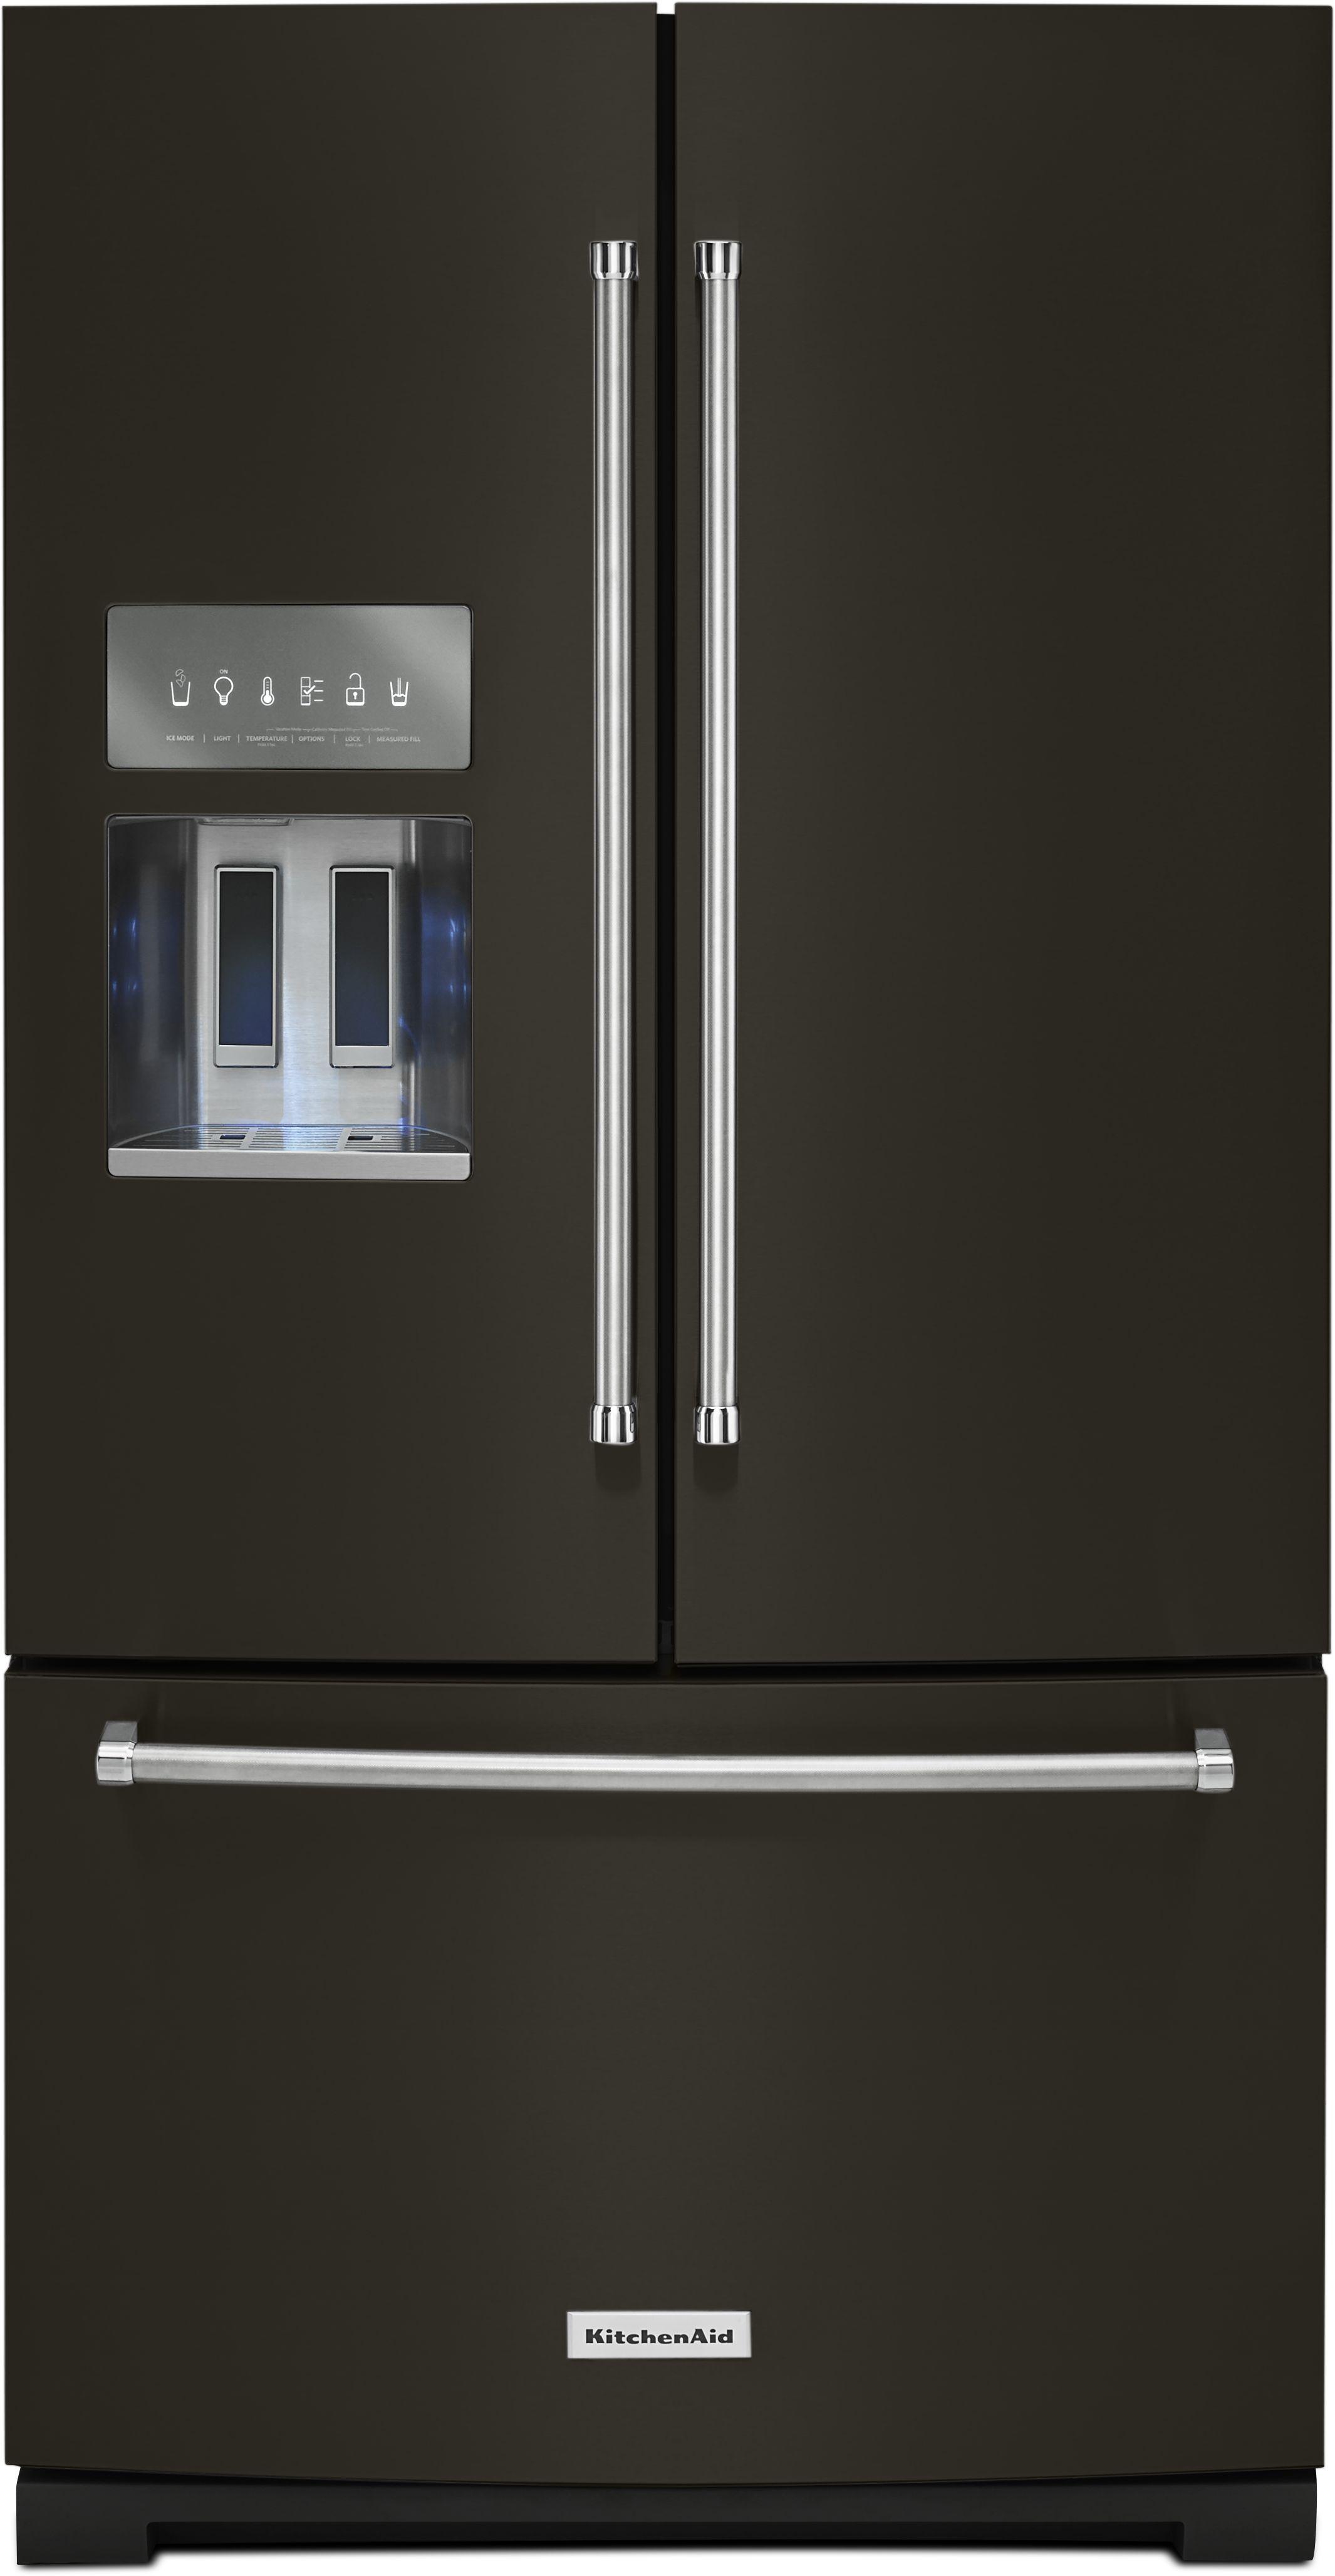 KitchenAid® 26.8 Cu. Ft. Standard Depth French Door Refrigerator Black  Stainless